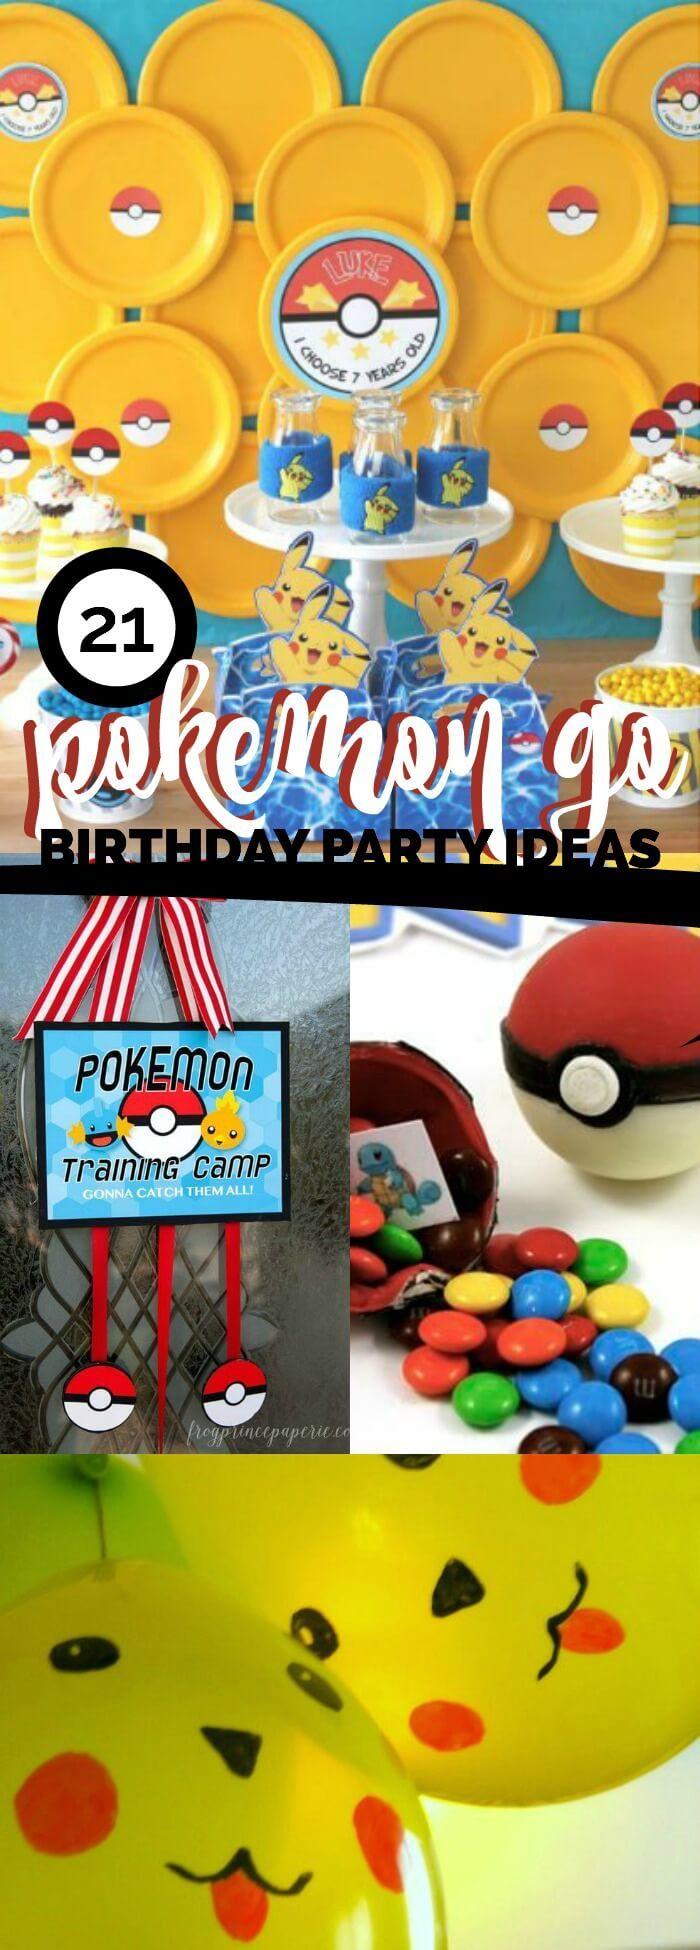 21 Top Pokemon Go Party Ideas